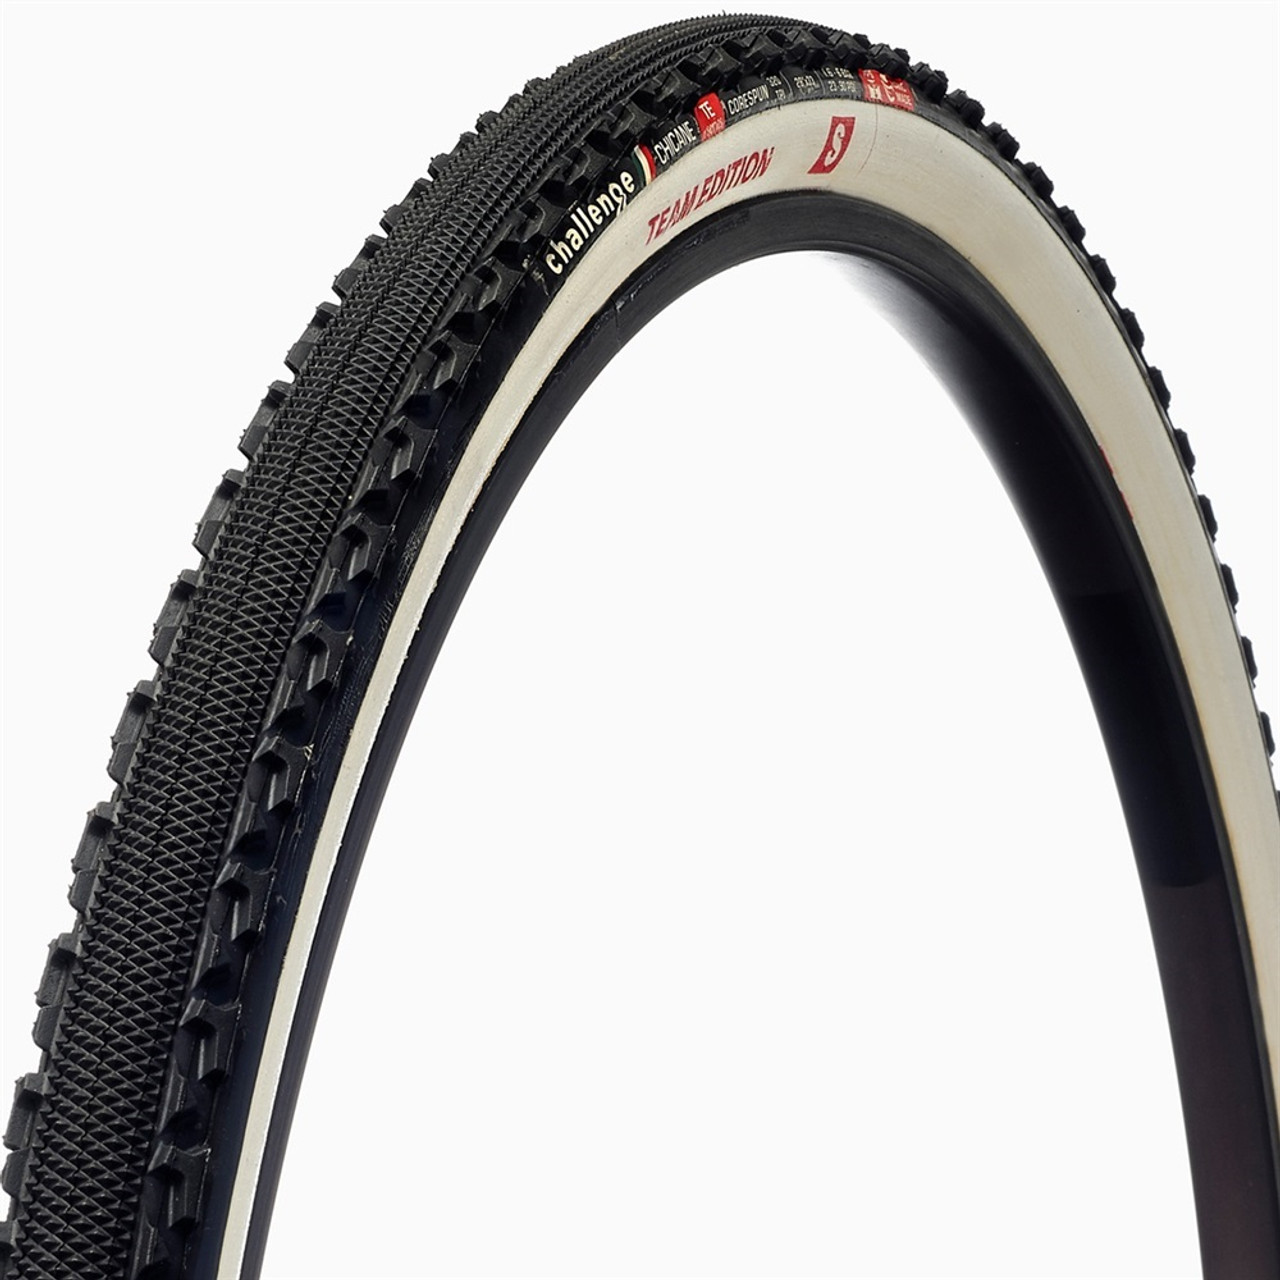 Challenge Chicane Team Edition Handmade Tubular Cyclocross Tyre 700 x 33 Black/White